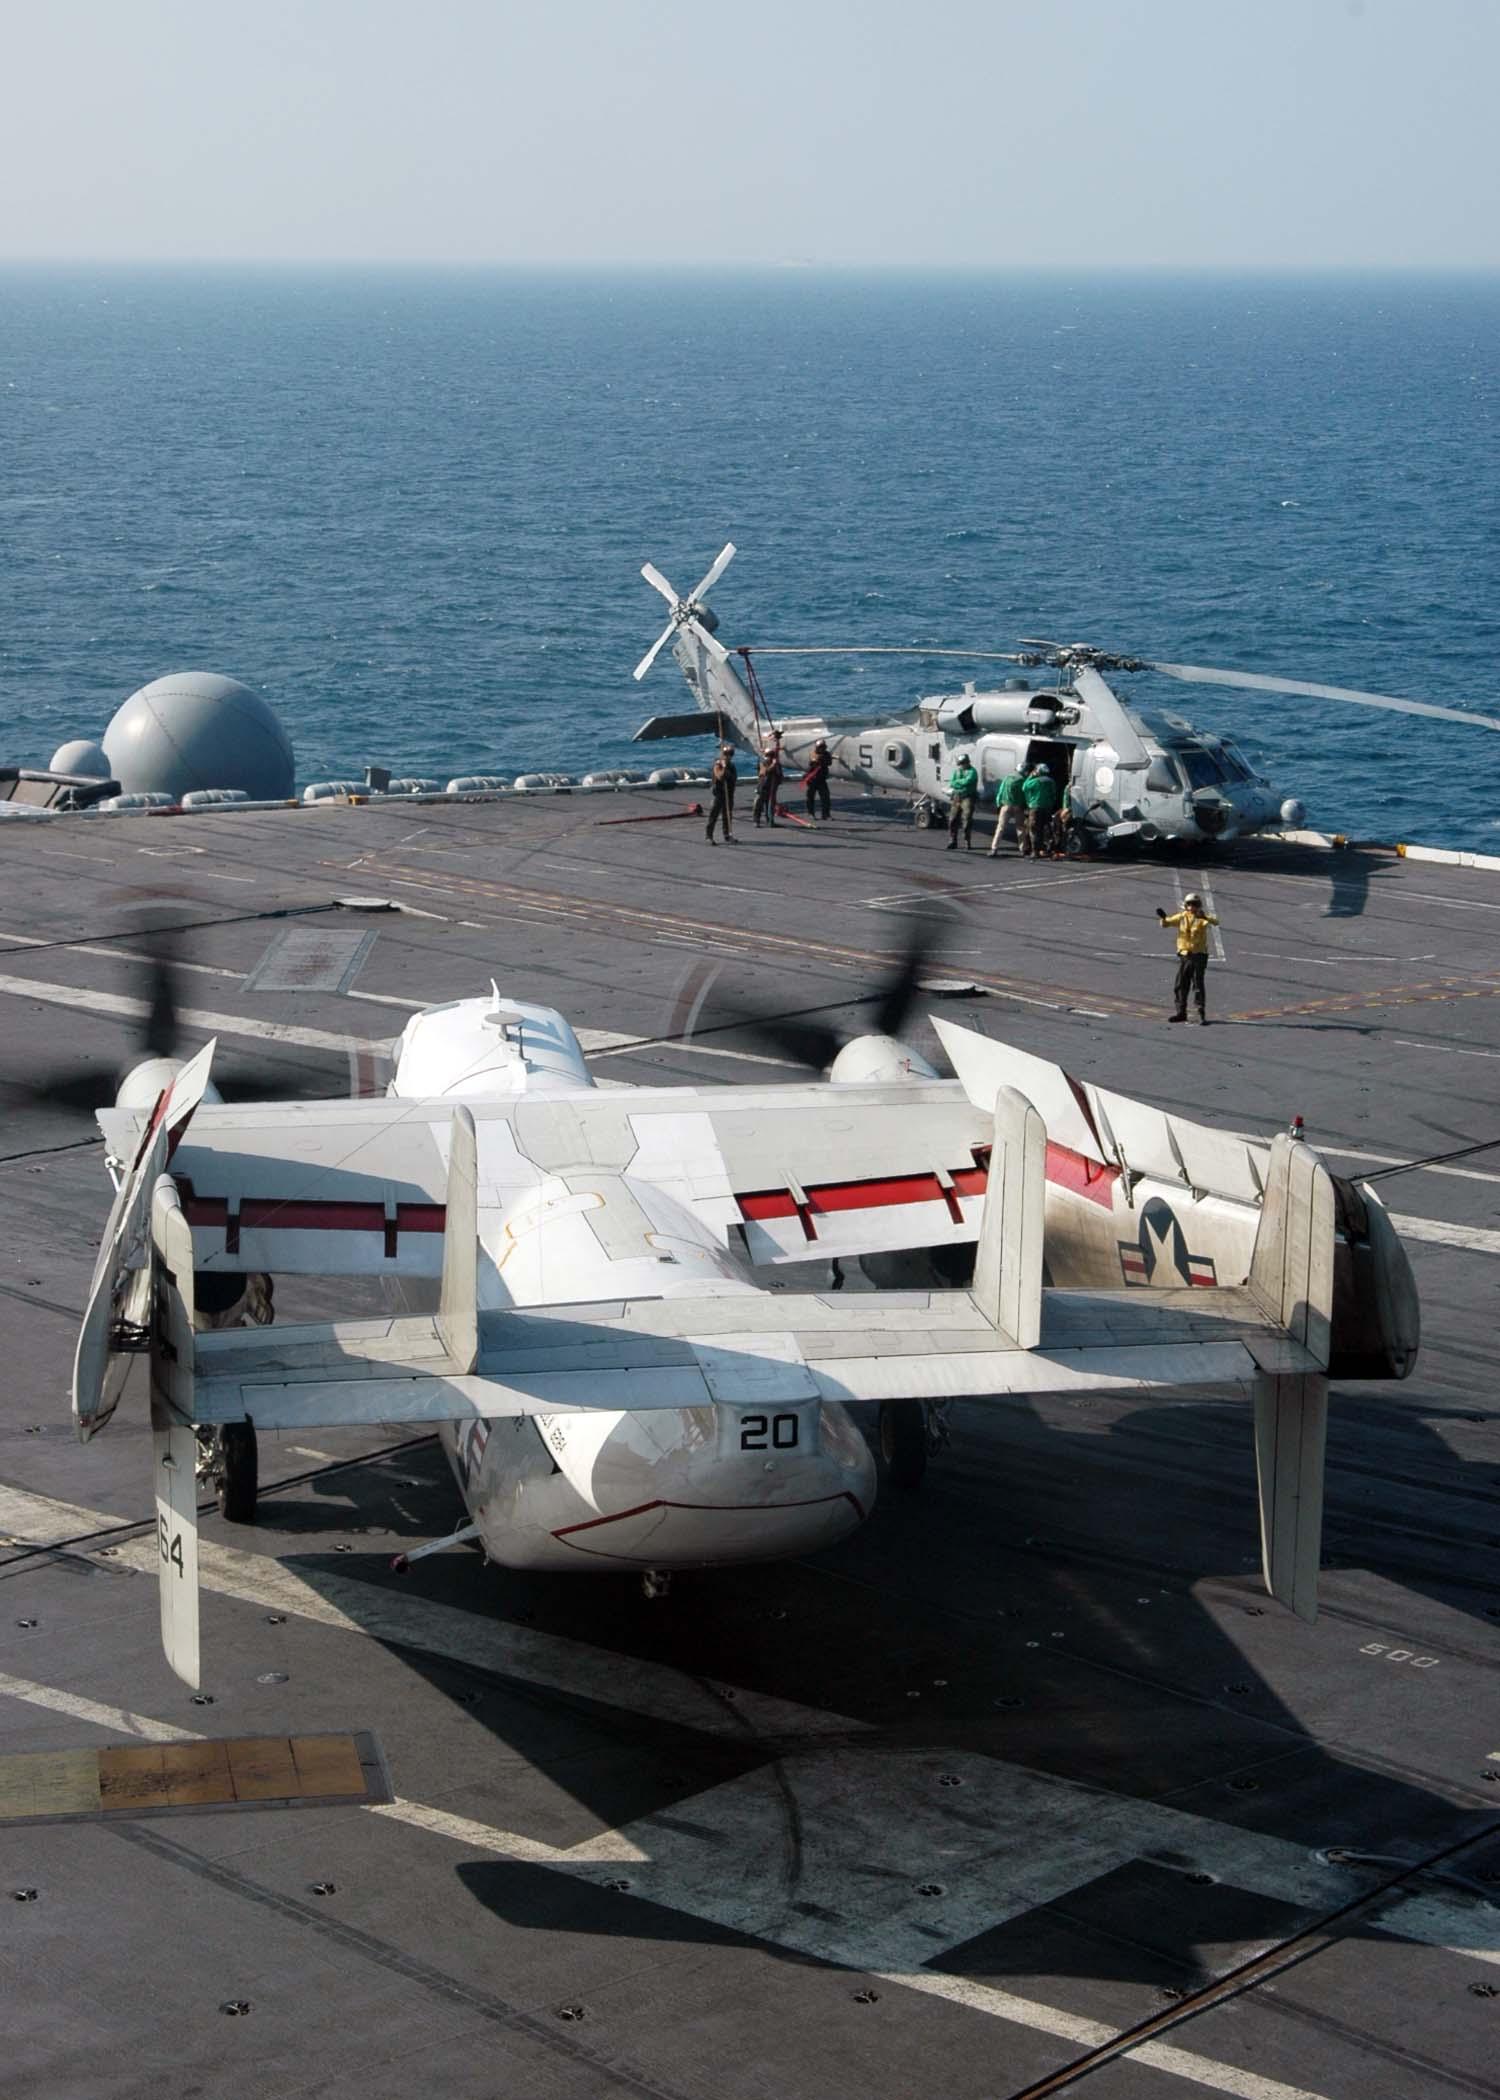 Grumman C-2 Greyhound - Wikipedia